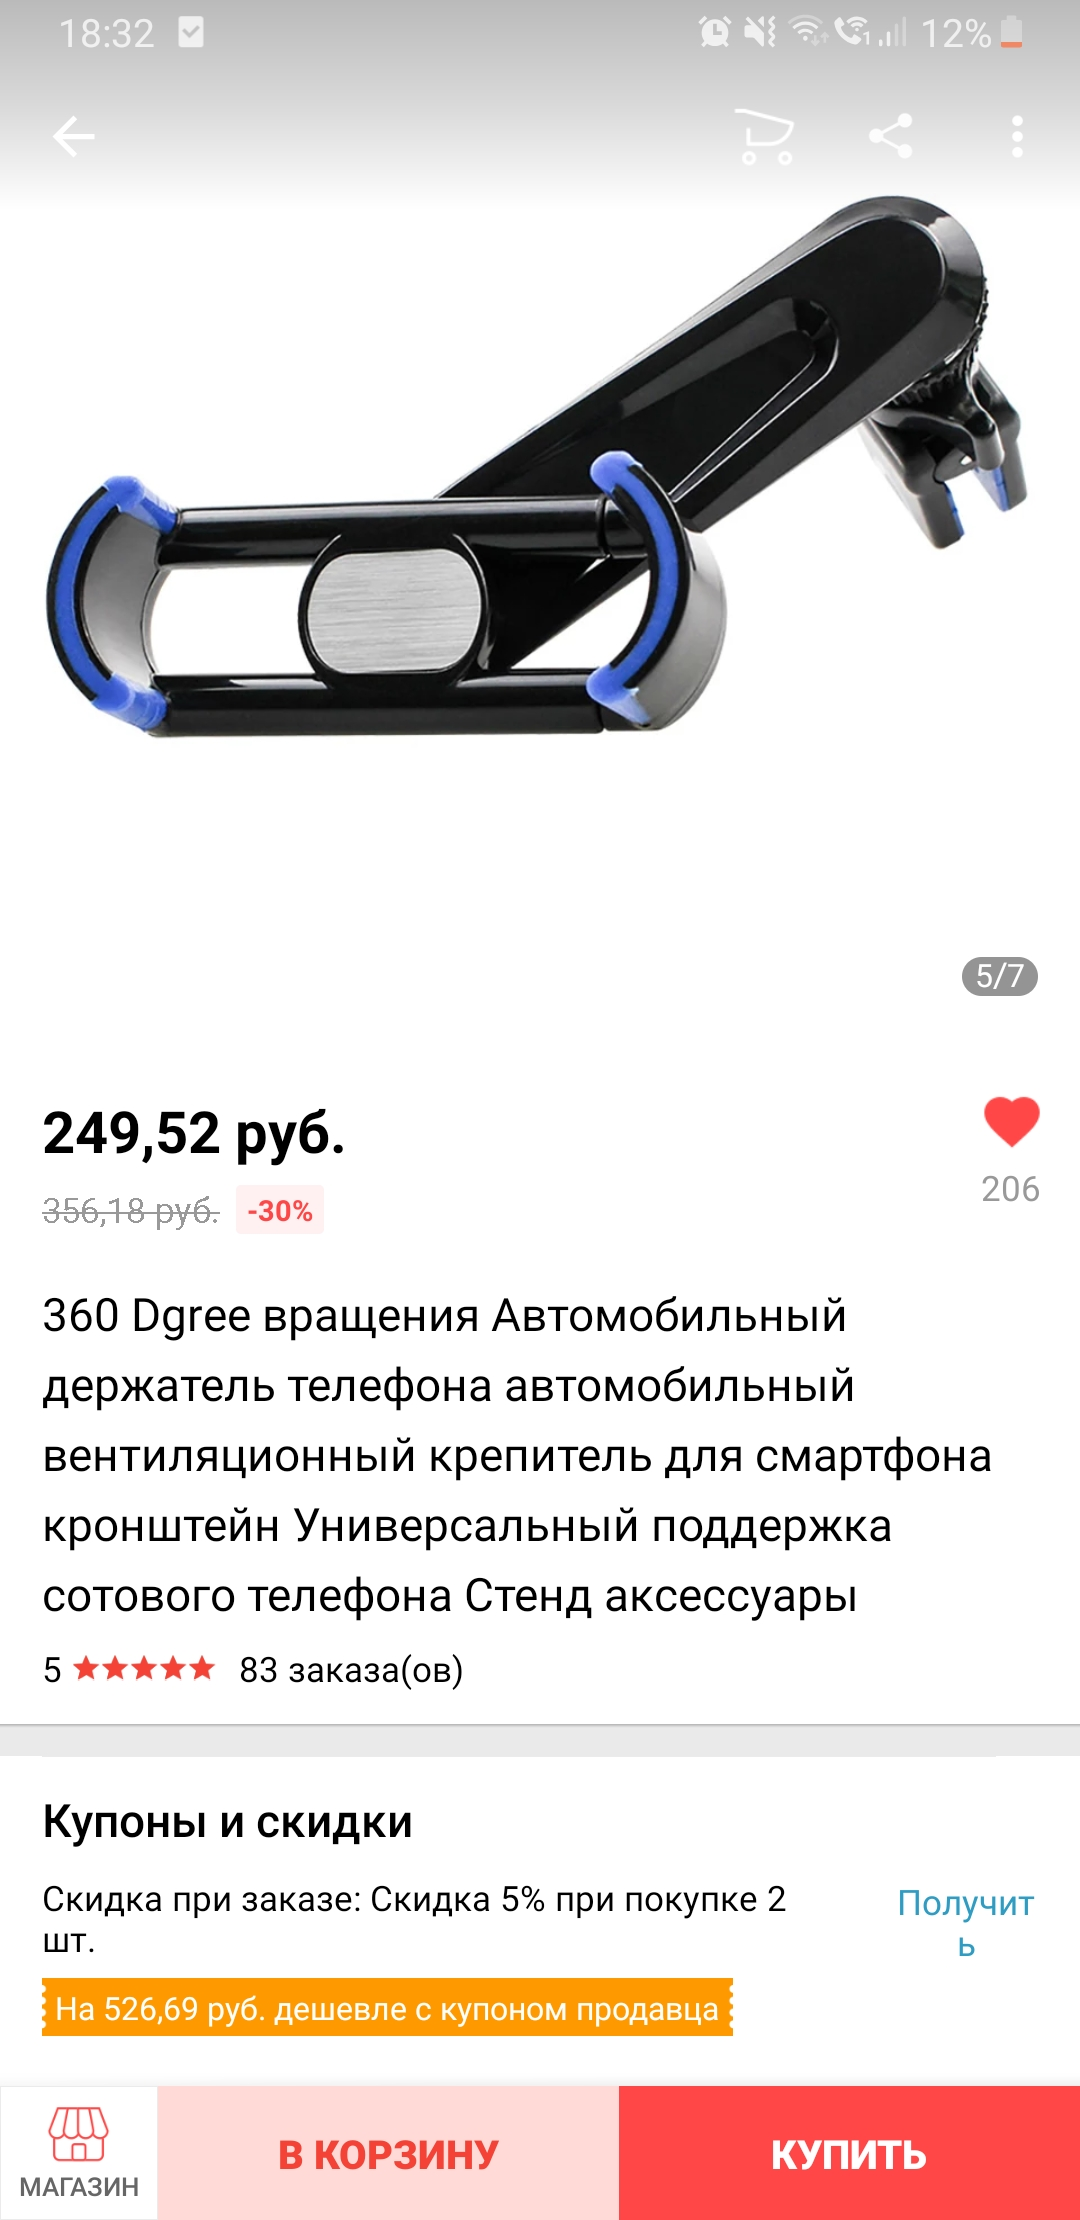 Screenshot_20190803-183244_AliExpress.jpg